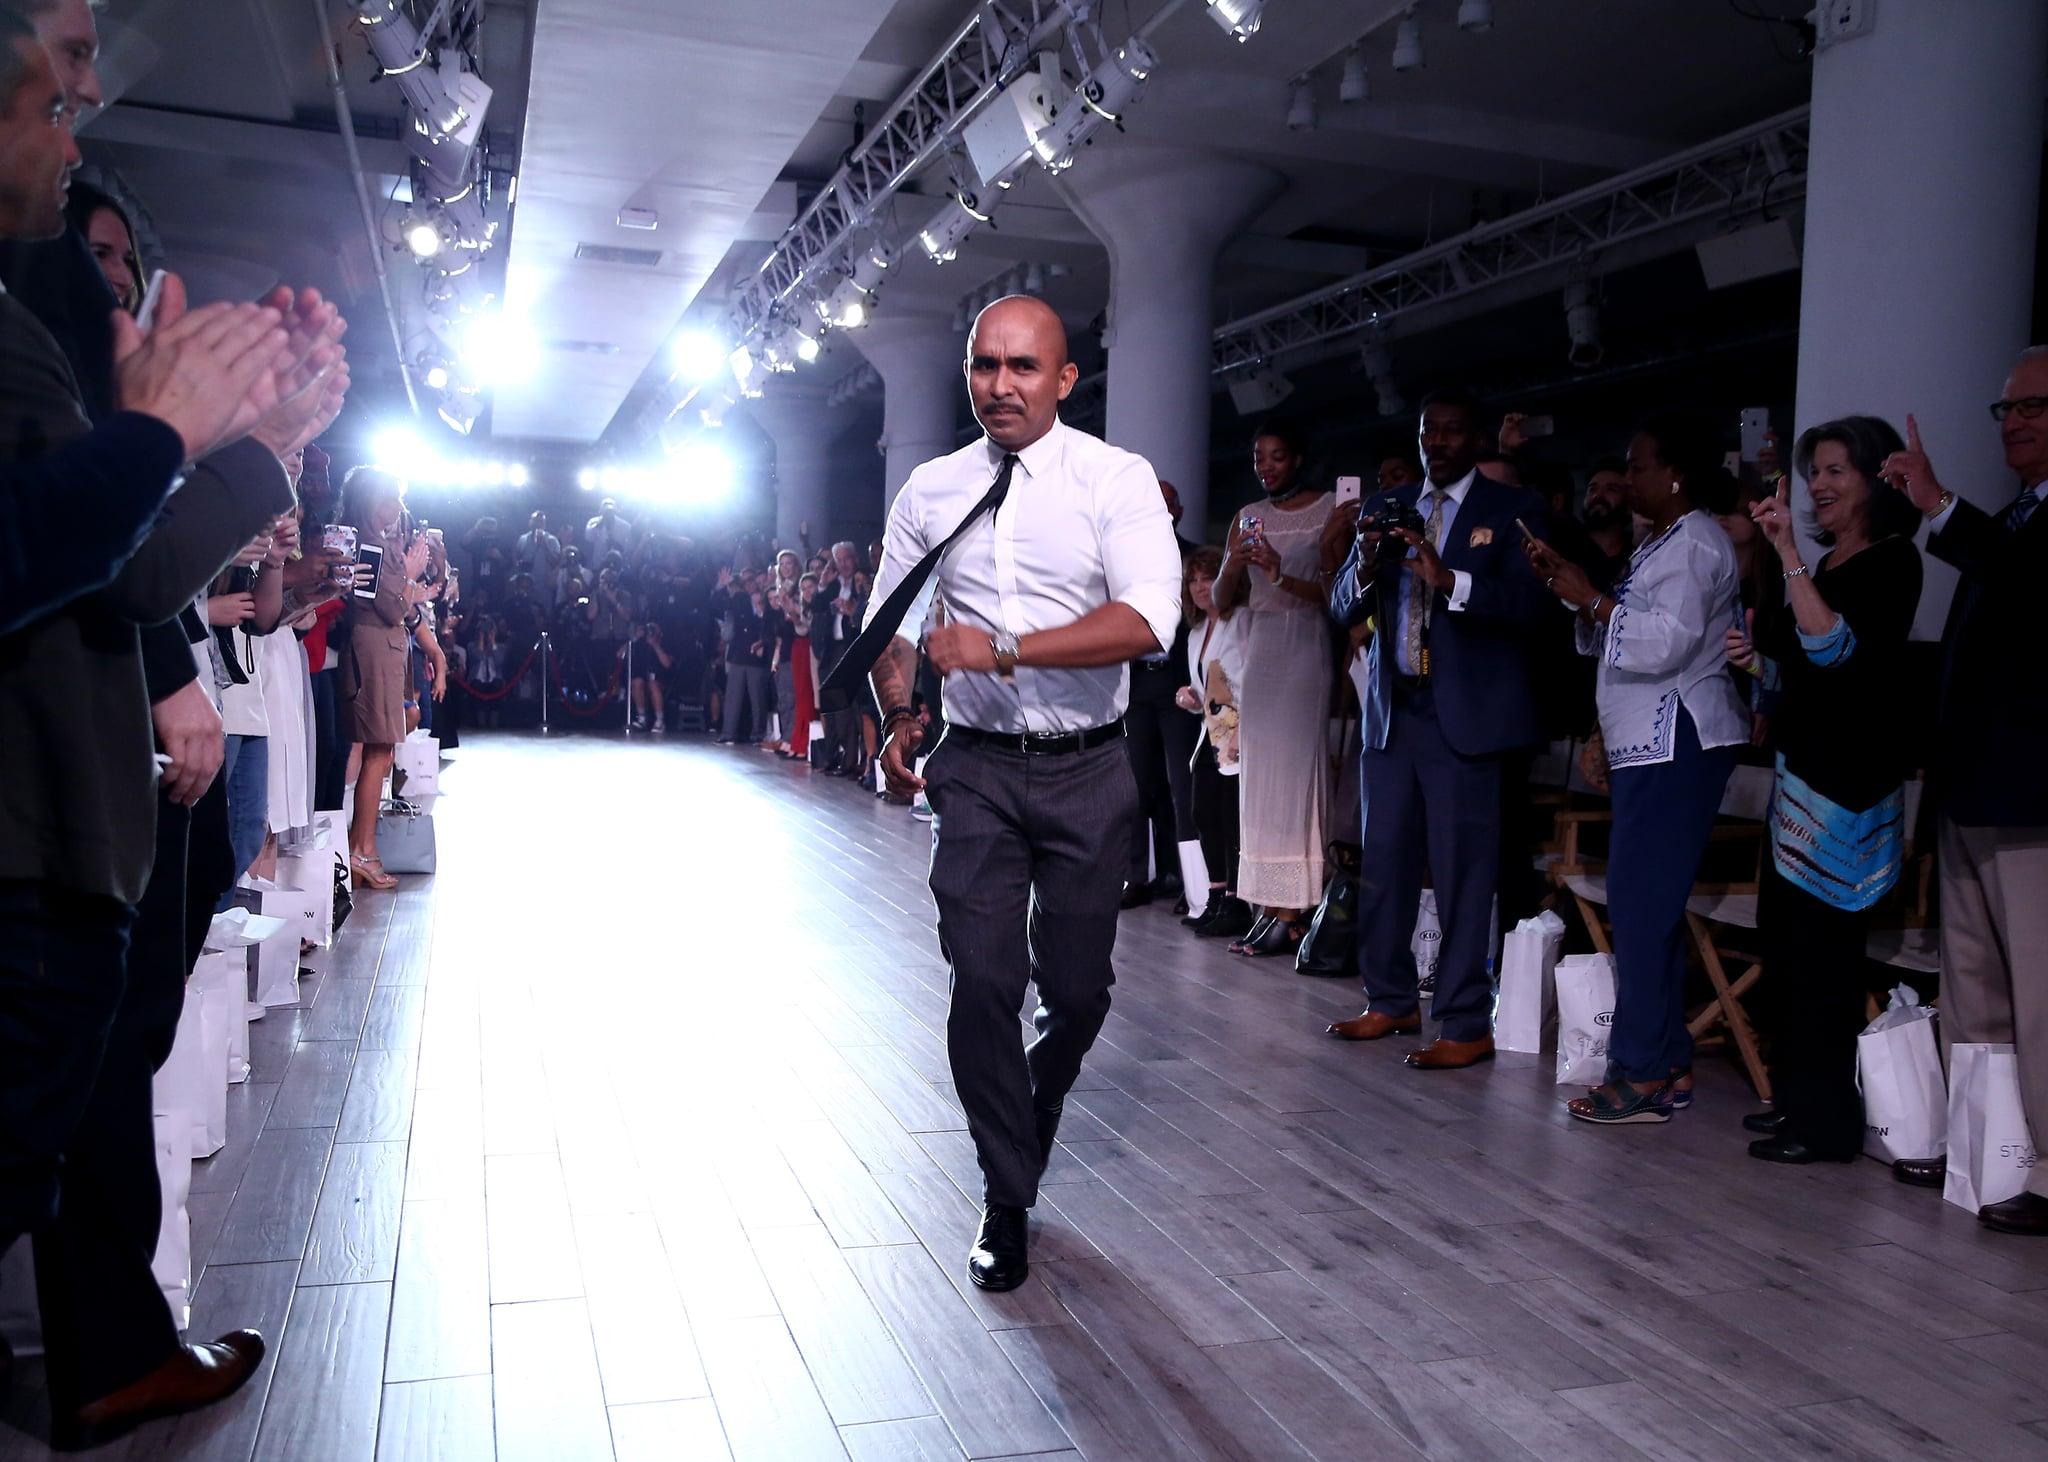 NEW YORK, NY - SEPTEMBER 13:  Raul Penaranda walks the runway at Kia STYLE360 Hosts Raul Penaranda Spring 2017 Momentum Fashion Show on September 13, 2016 in New York City.  (Photo by Thomas Concordia/WireImage Style360)